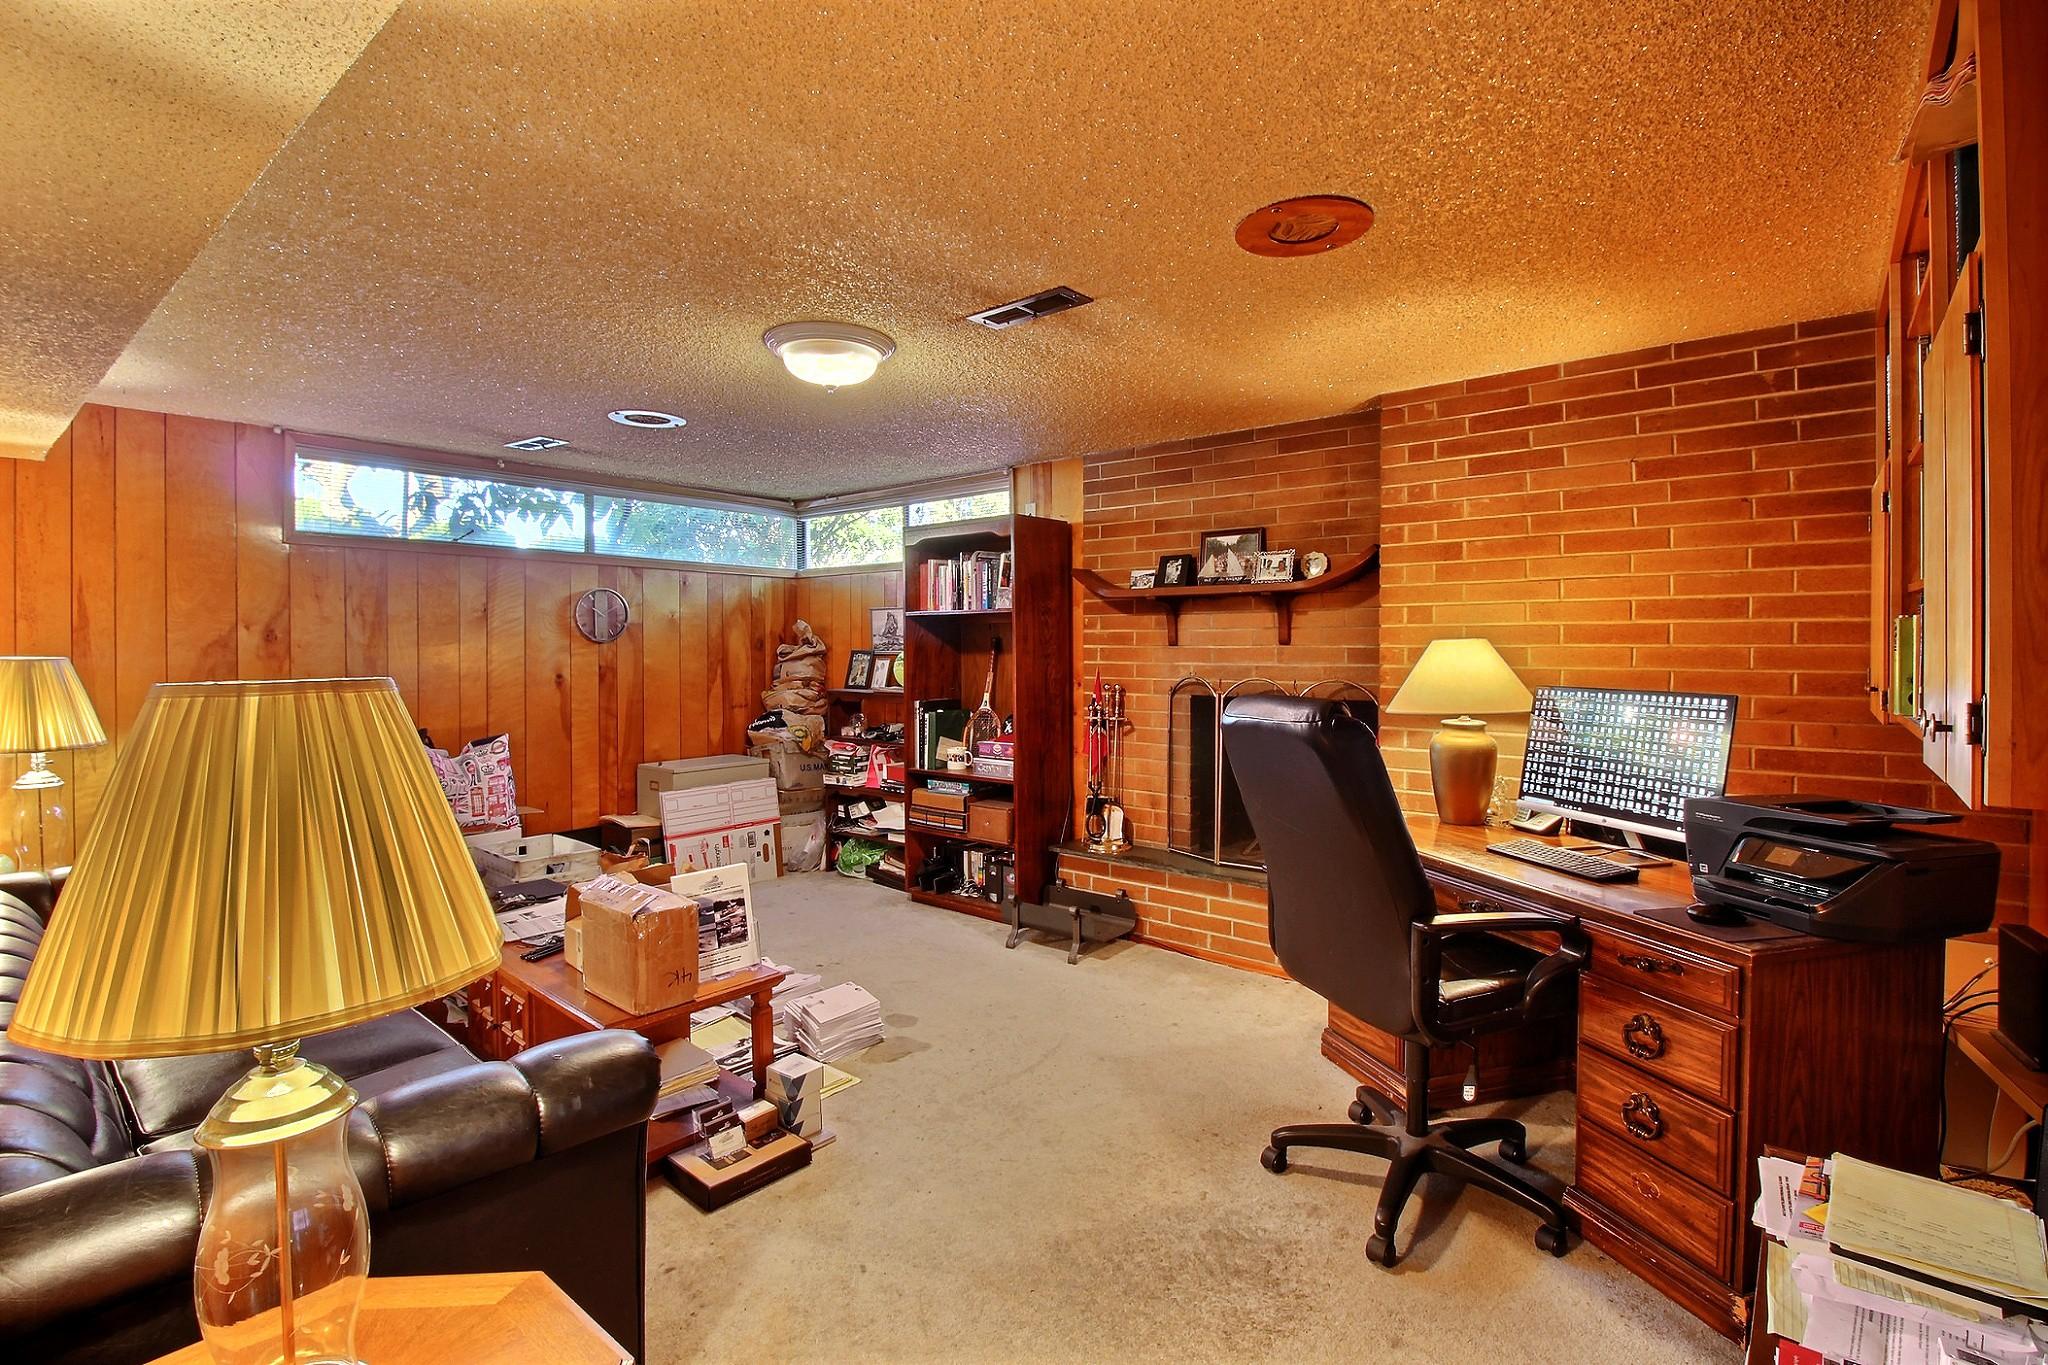 07-basement2601.jpg